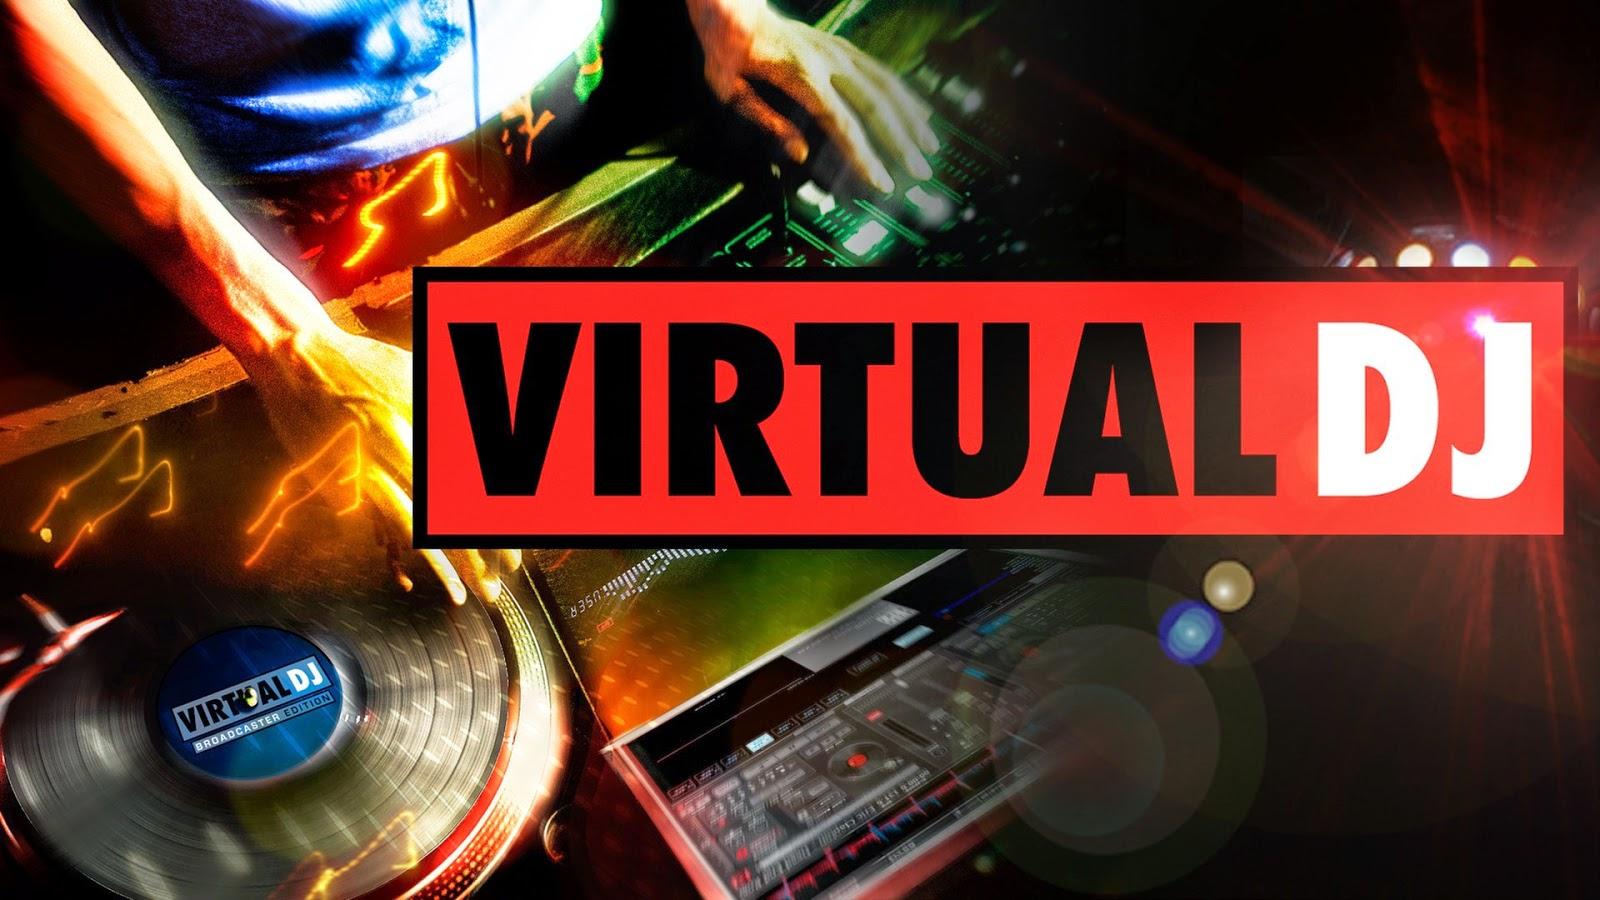 Download Crack Virtual DJ Pro 7.0.5 For Free